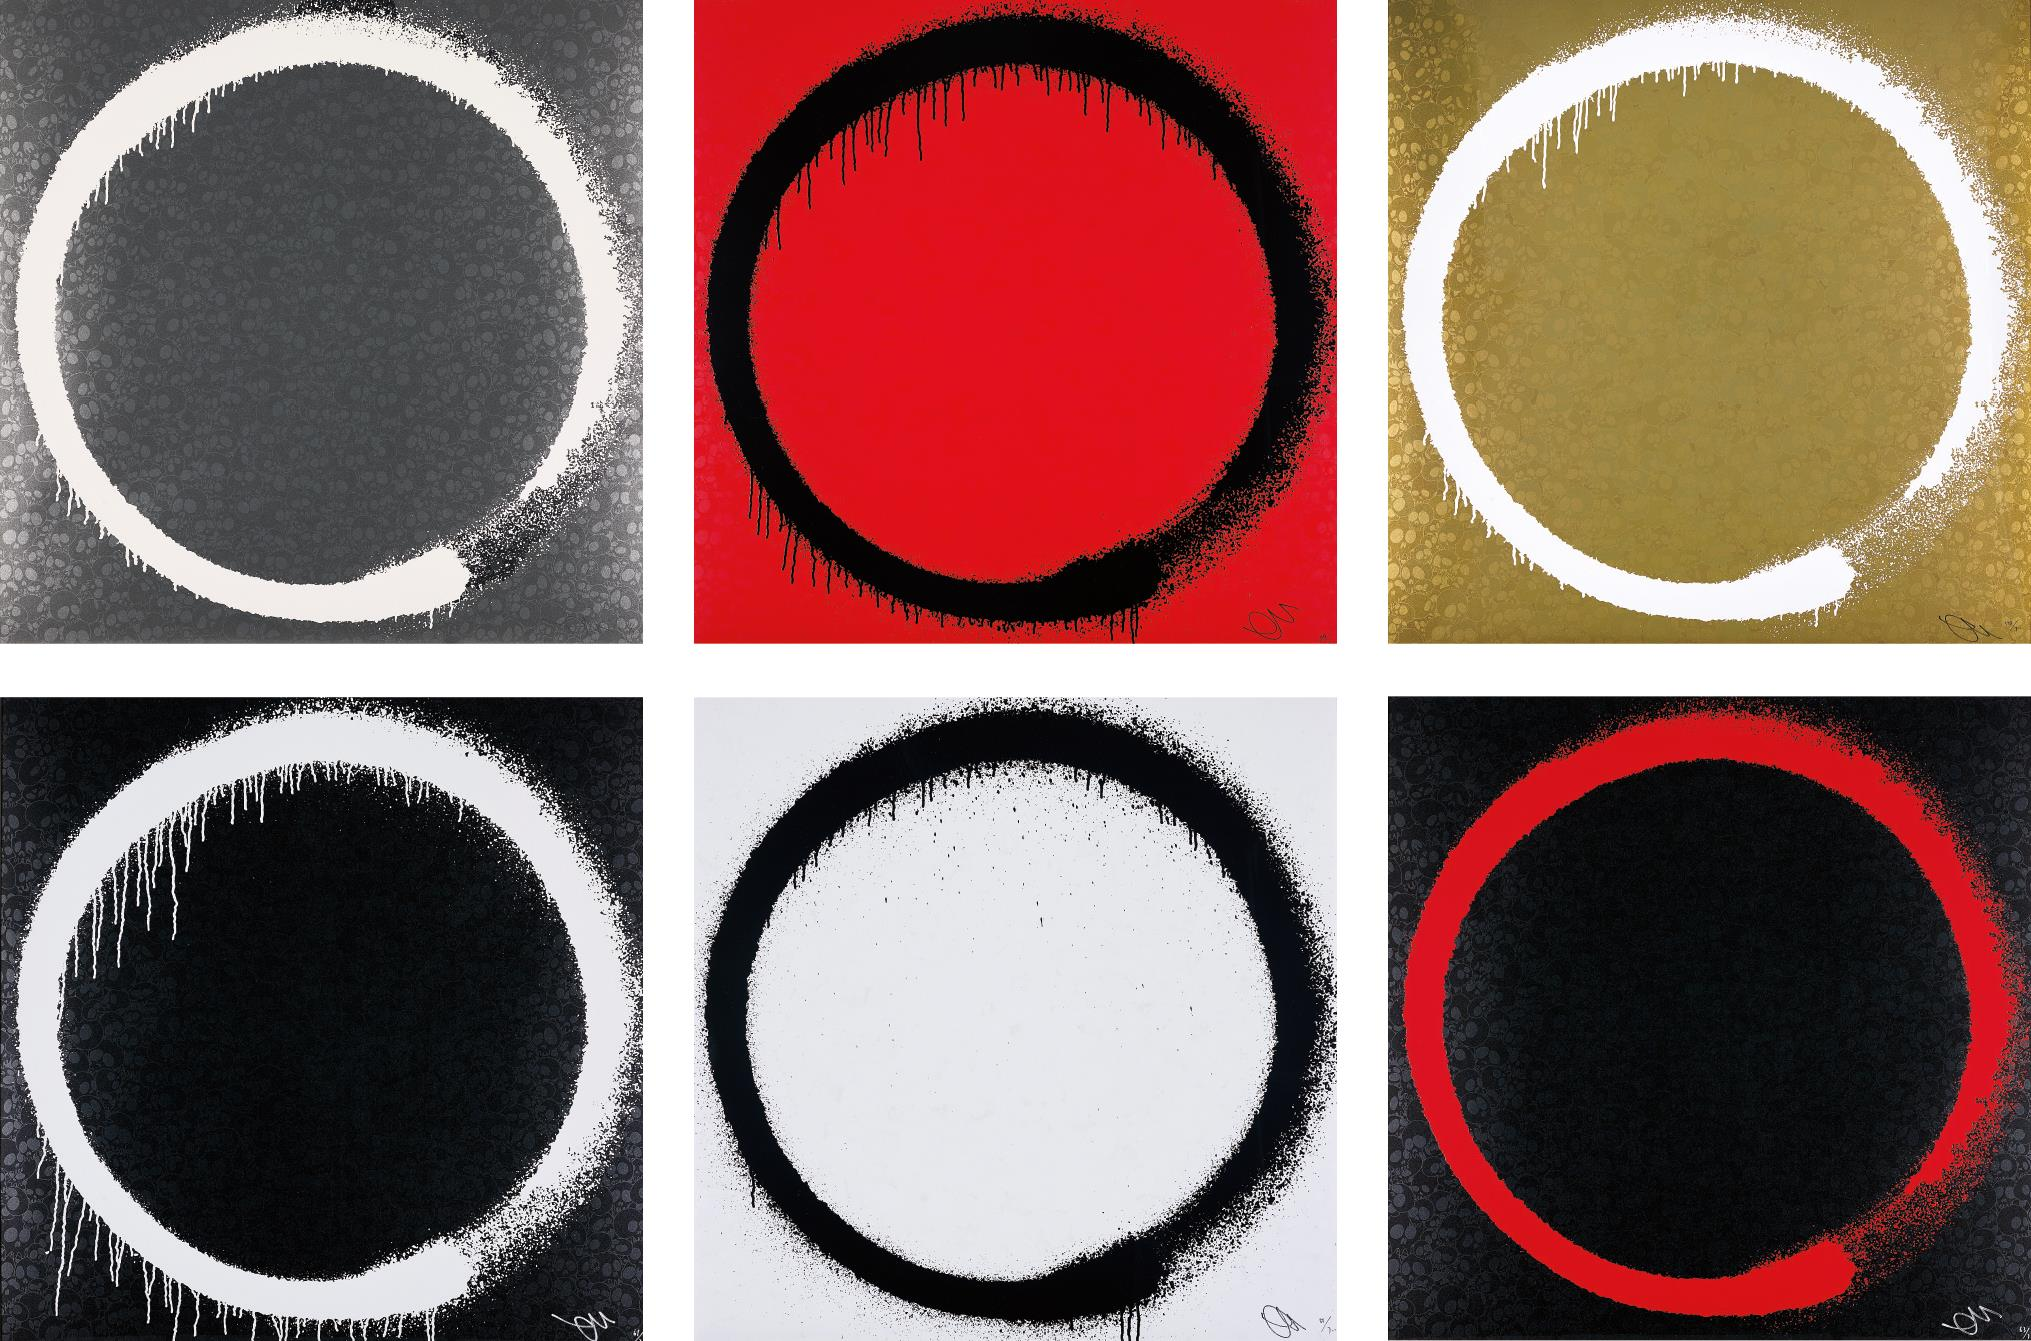 Takashi Murakami-Agama; Enso: The Heart; Amitabha Buddha; Enso: Intellection; Enso: Tranquility; and Enso: Earthly Desires-2015